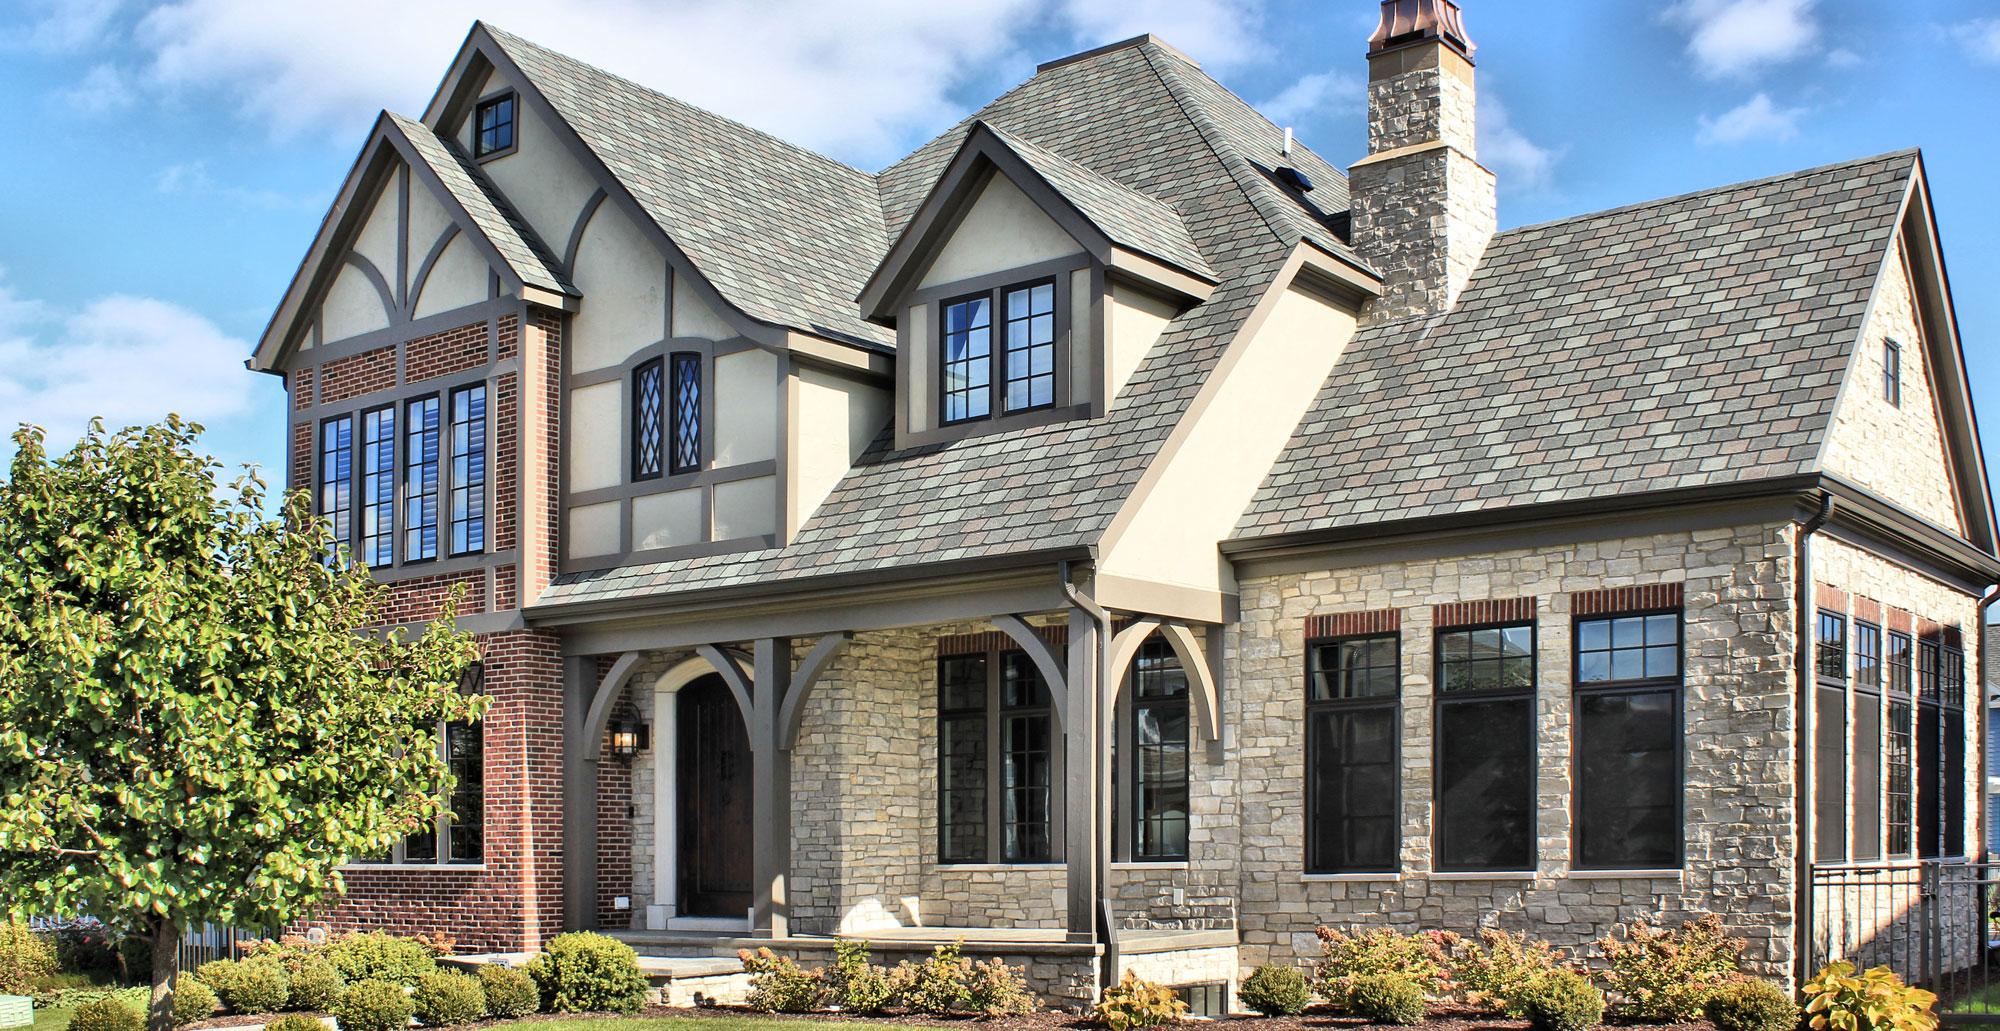 fond-du-lac-country-squire-brick-veneer-stone-home-full-thin-stone-veneer-45a-1280x660.jpg